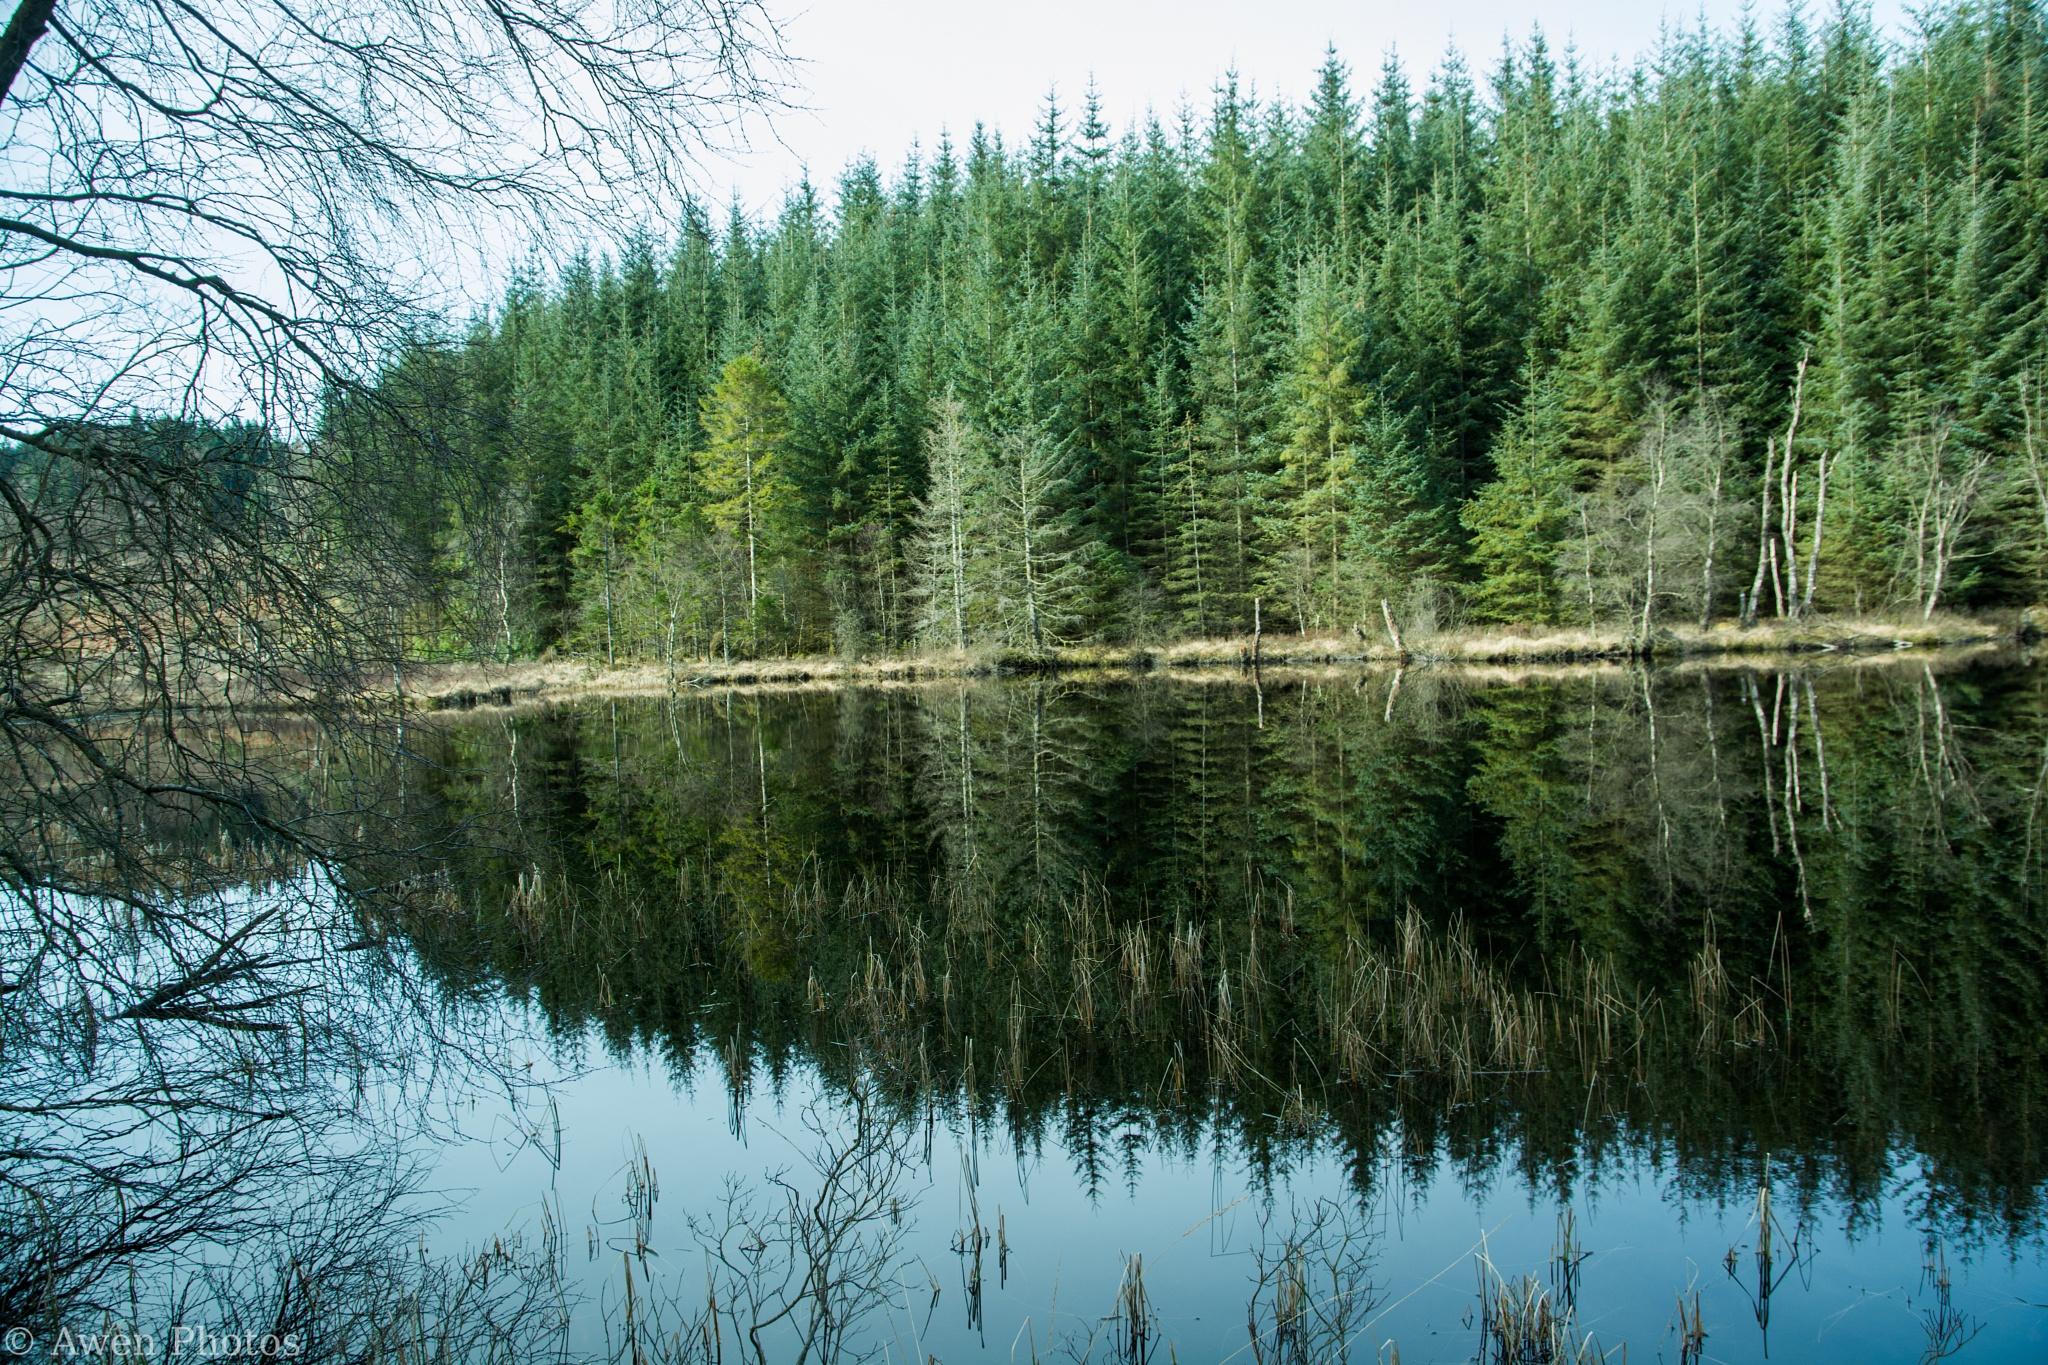 Scottish Reflections (1) by Neil Pitchford